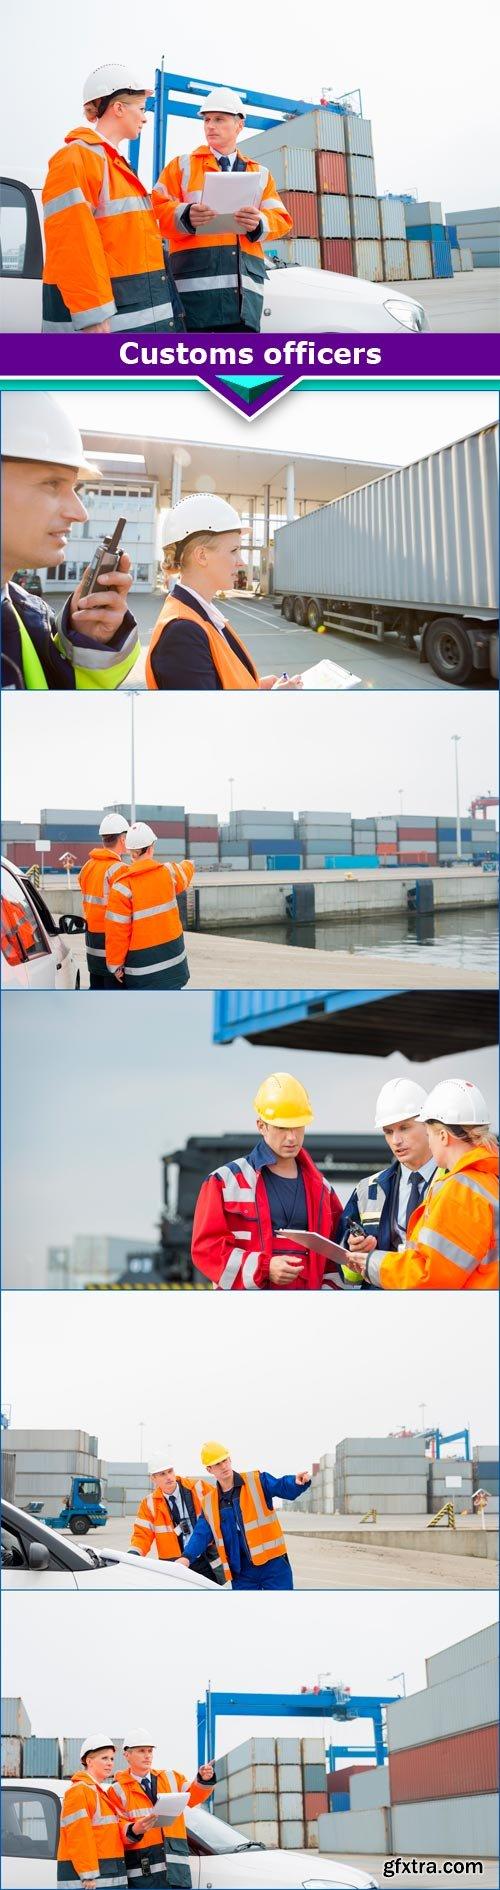 Customs officers 6x JPEG